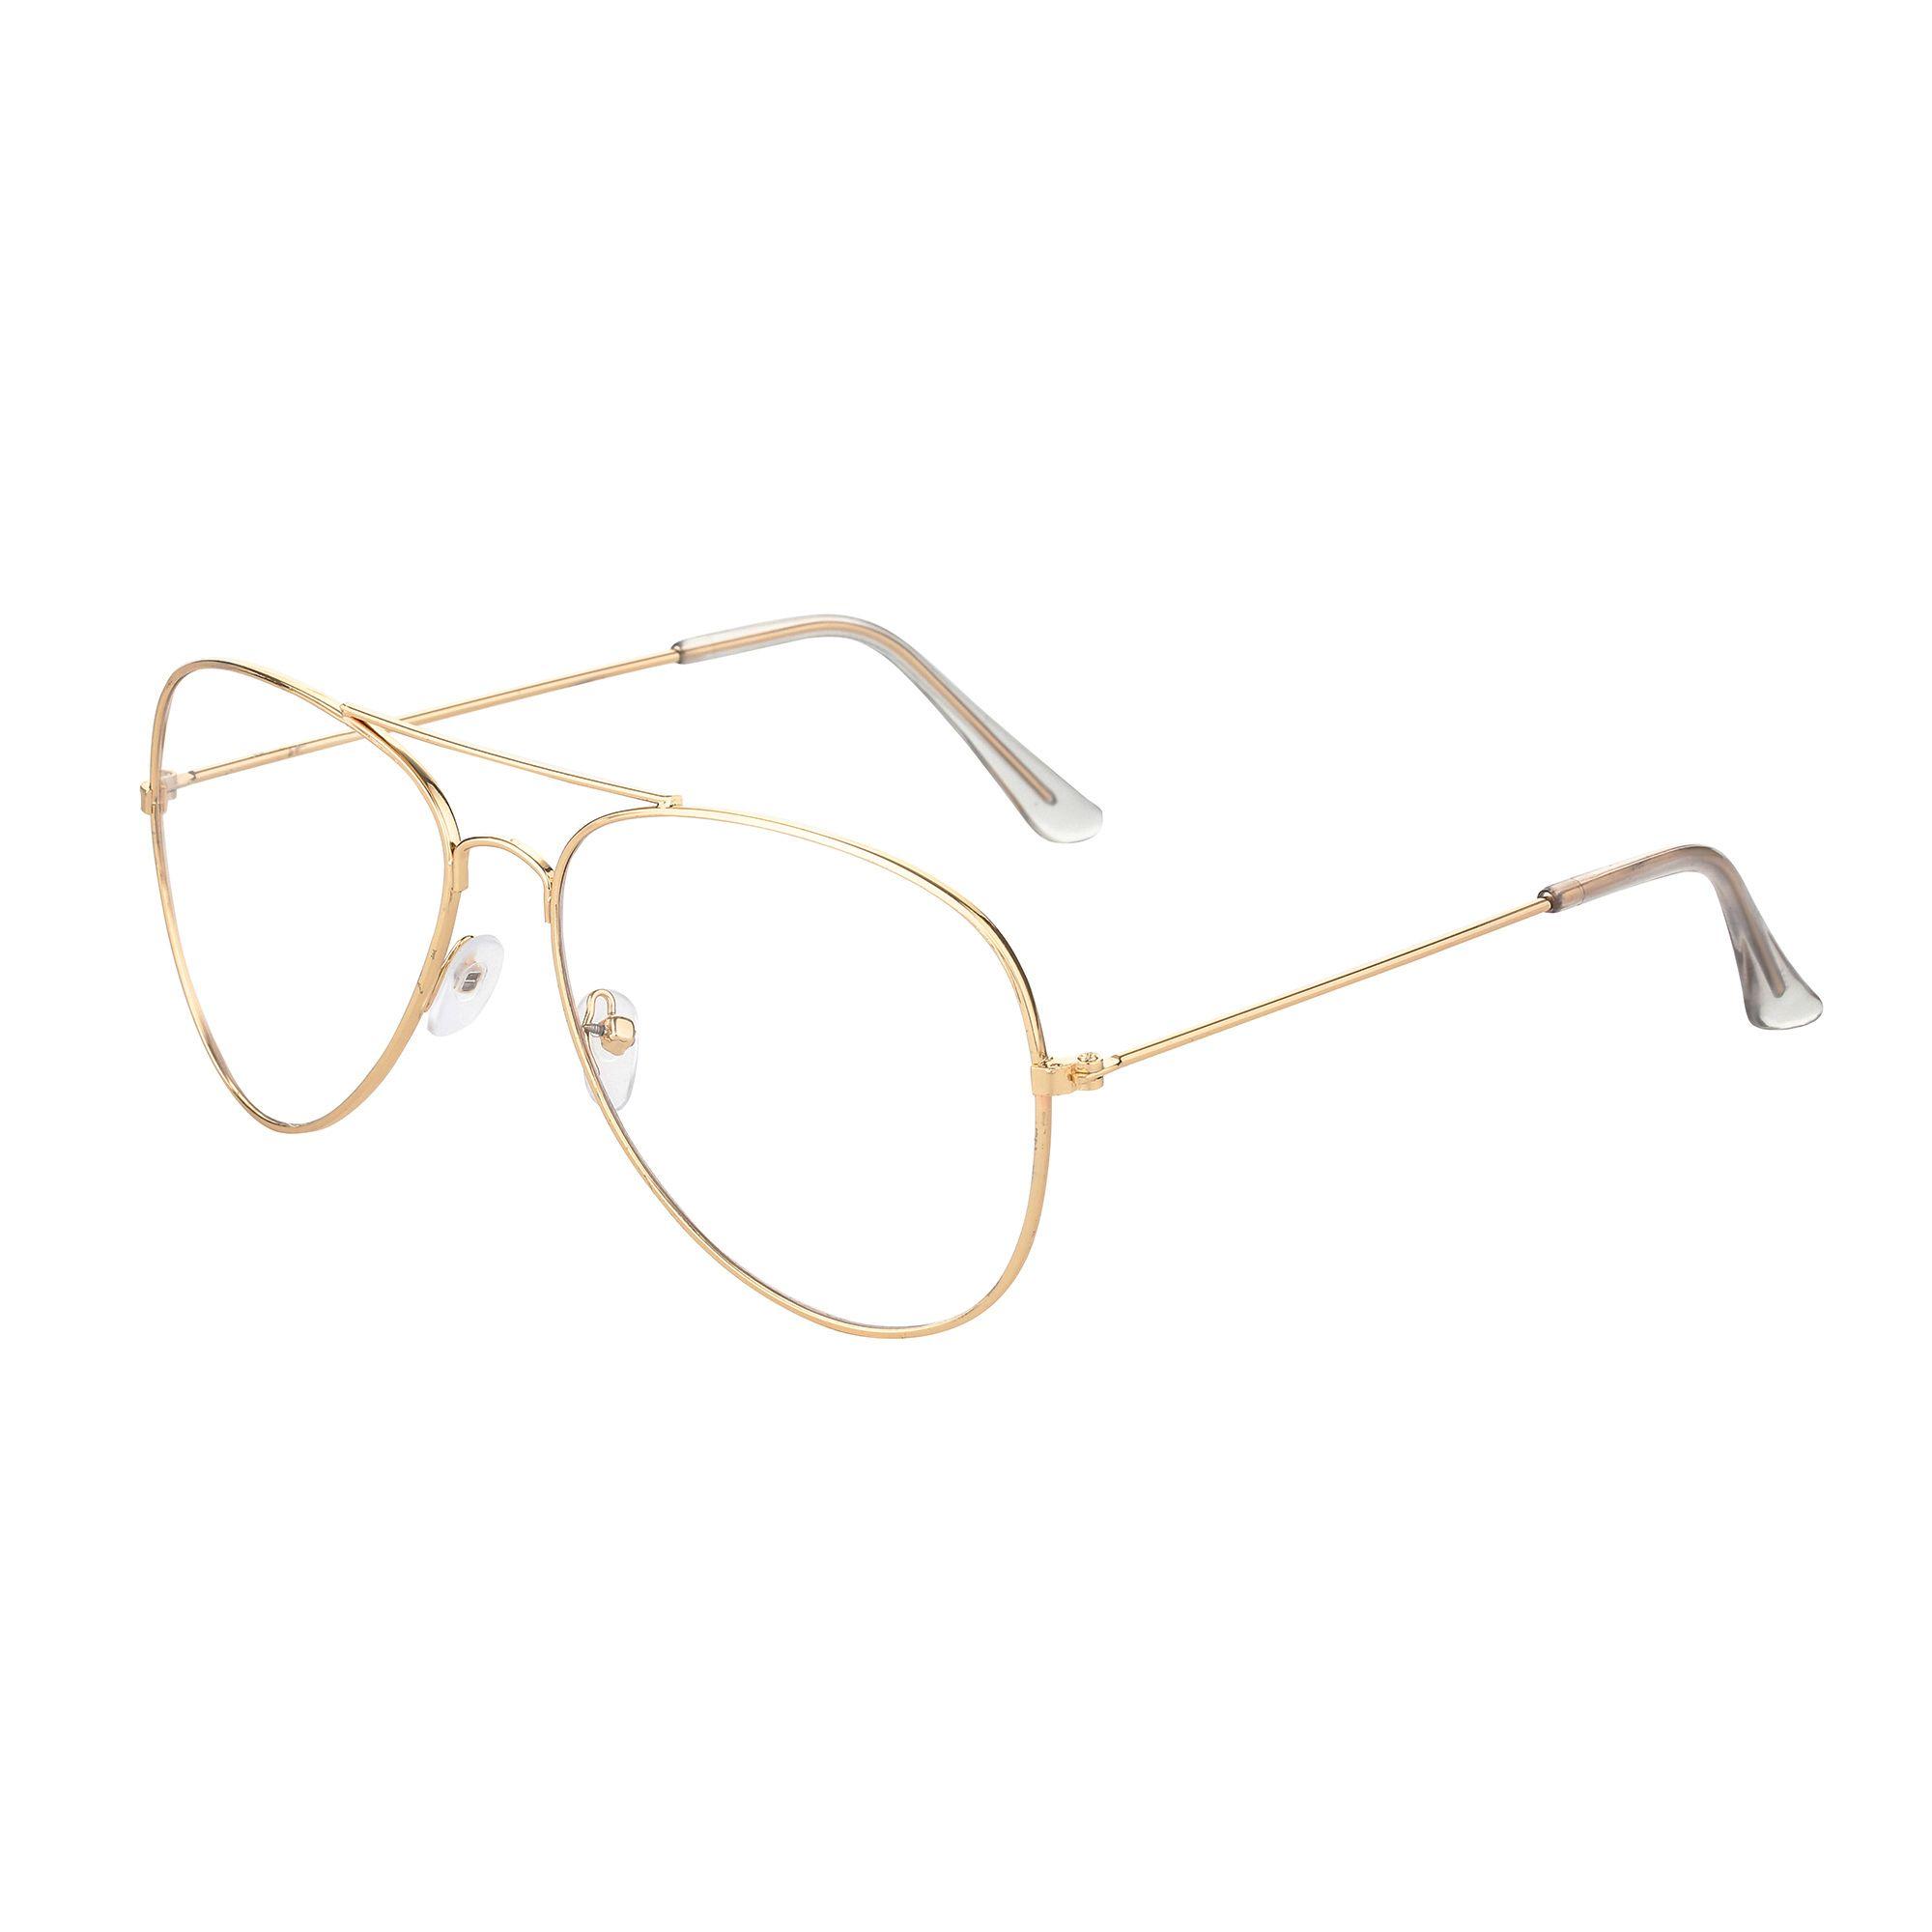 39b931acdd8 Aviation Alloy Frame Sunglasses Female Classic Optics Eyeglasses  Transparent Clear Lens Women Men glasses Optical Pilot Style